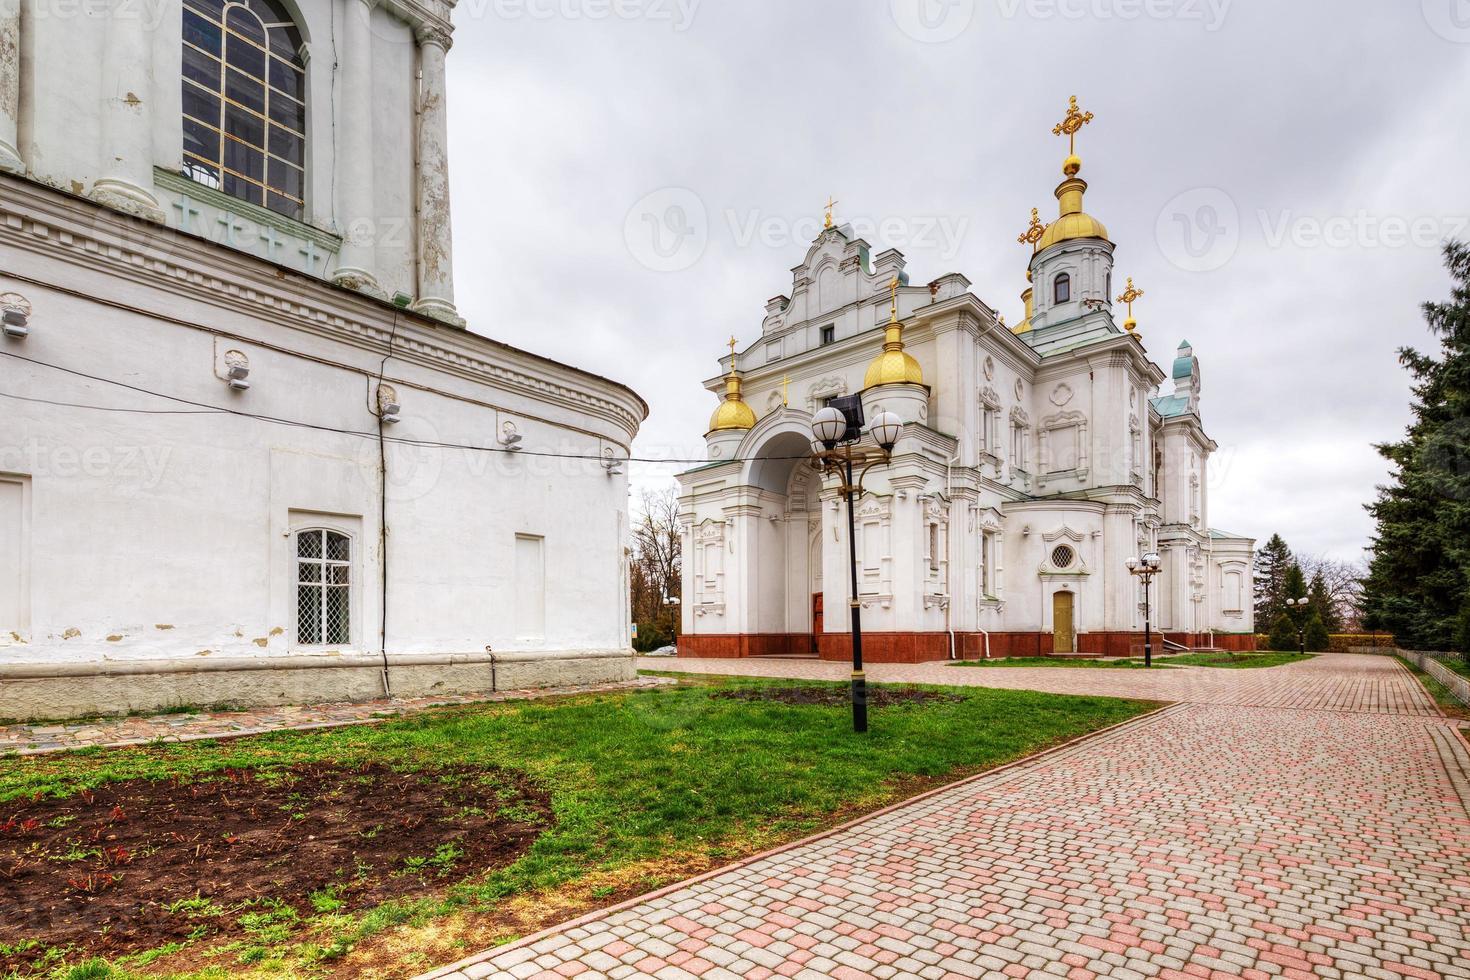 architecture de poltava. Ukraine. photo